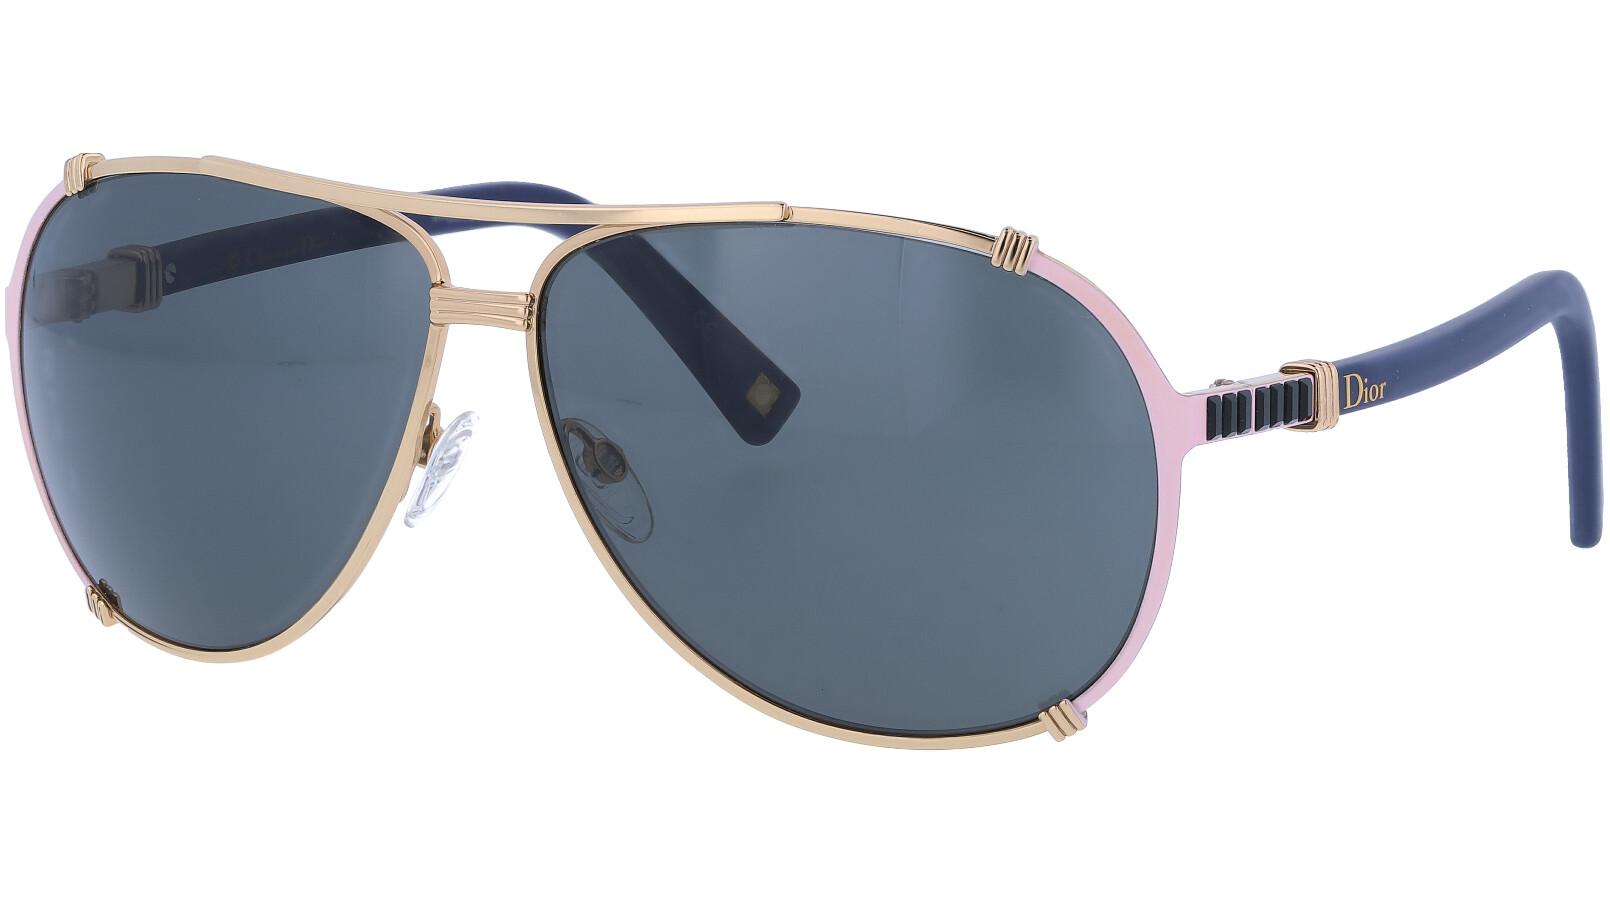 Dior CHICAGO2STR UPXHA 63 RSGDBRWORNBR Sunglasses